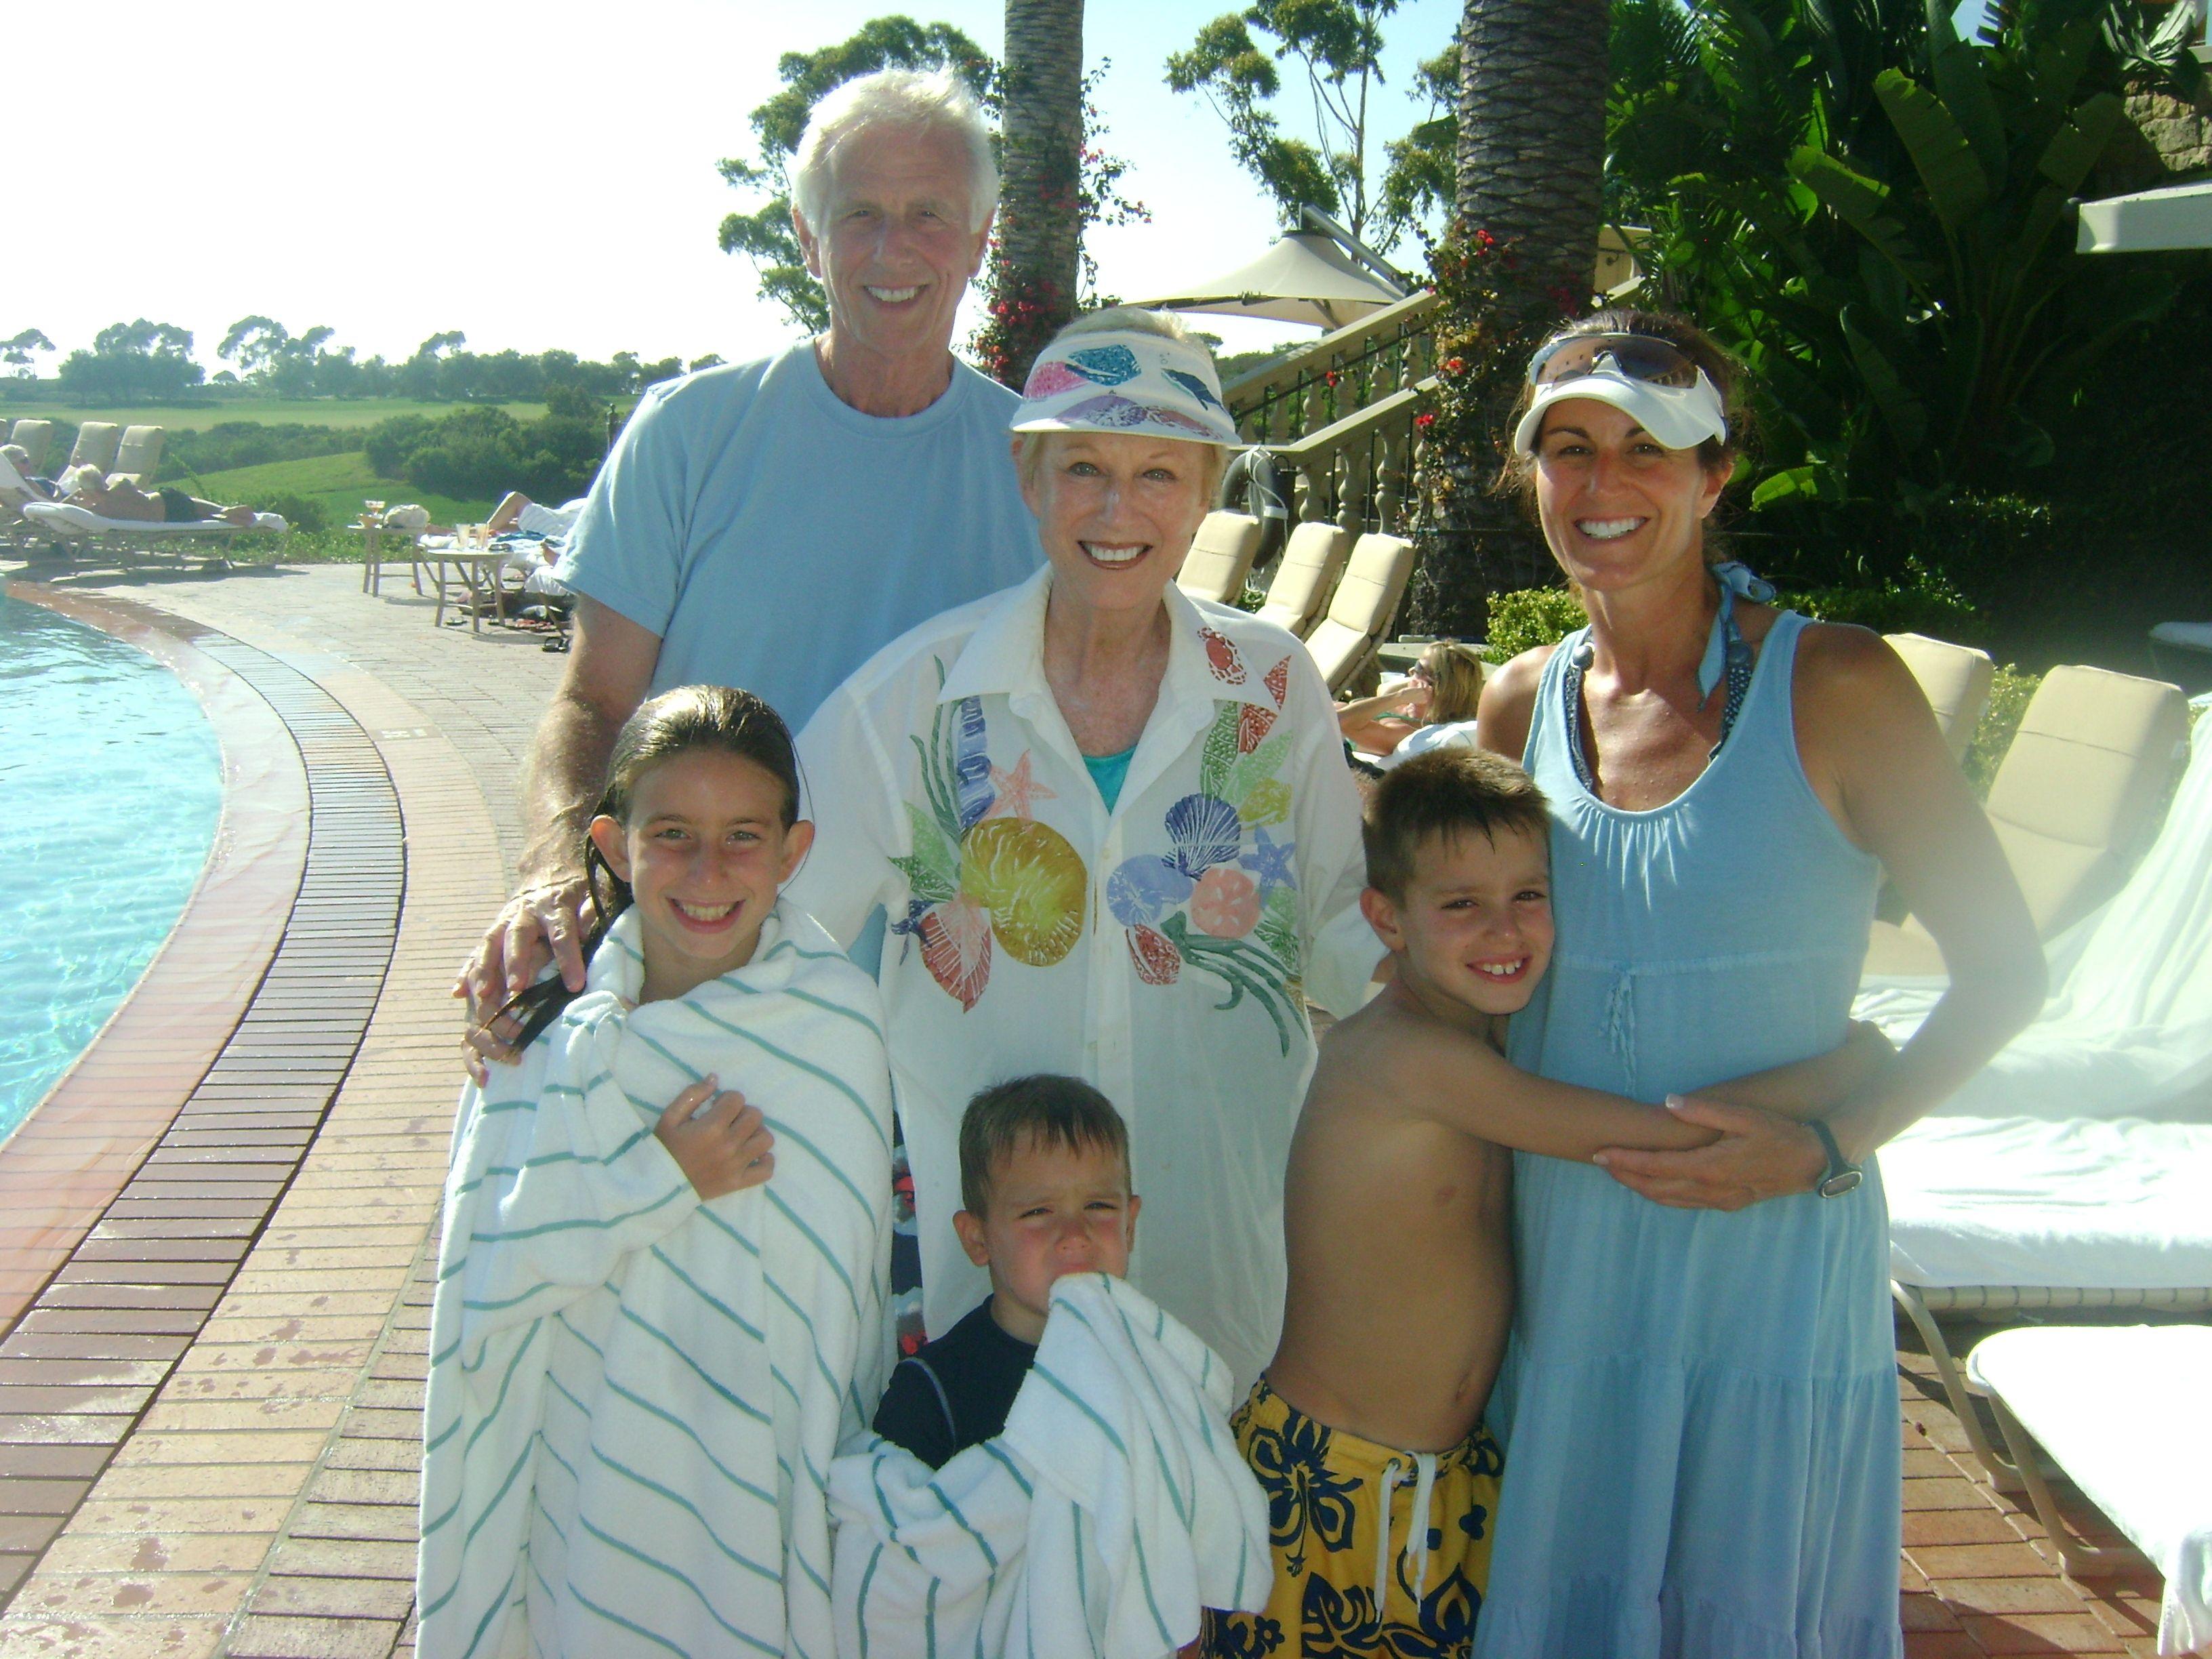 Three generations making memories that will last a lifetime at Pelican Hill | www.pelicanhill.com |The Resort at Pelican Hill, Newport Beach, CA | #pelicanhillresort #family #memories